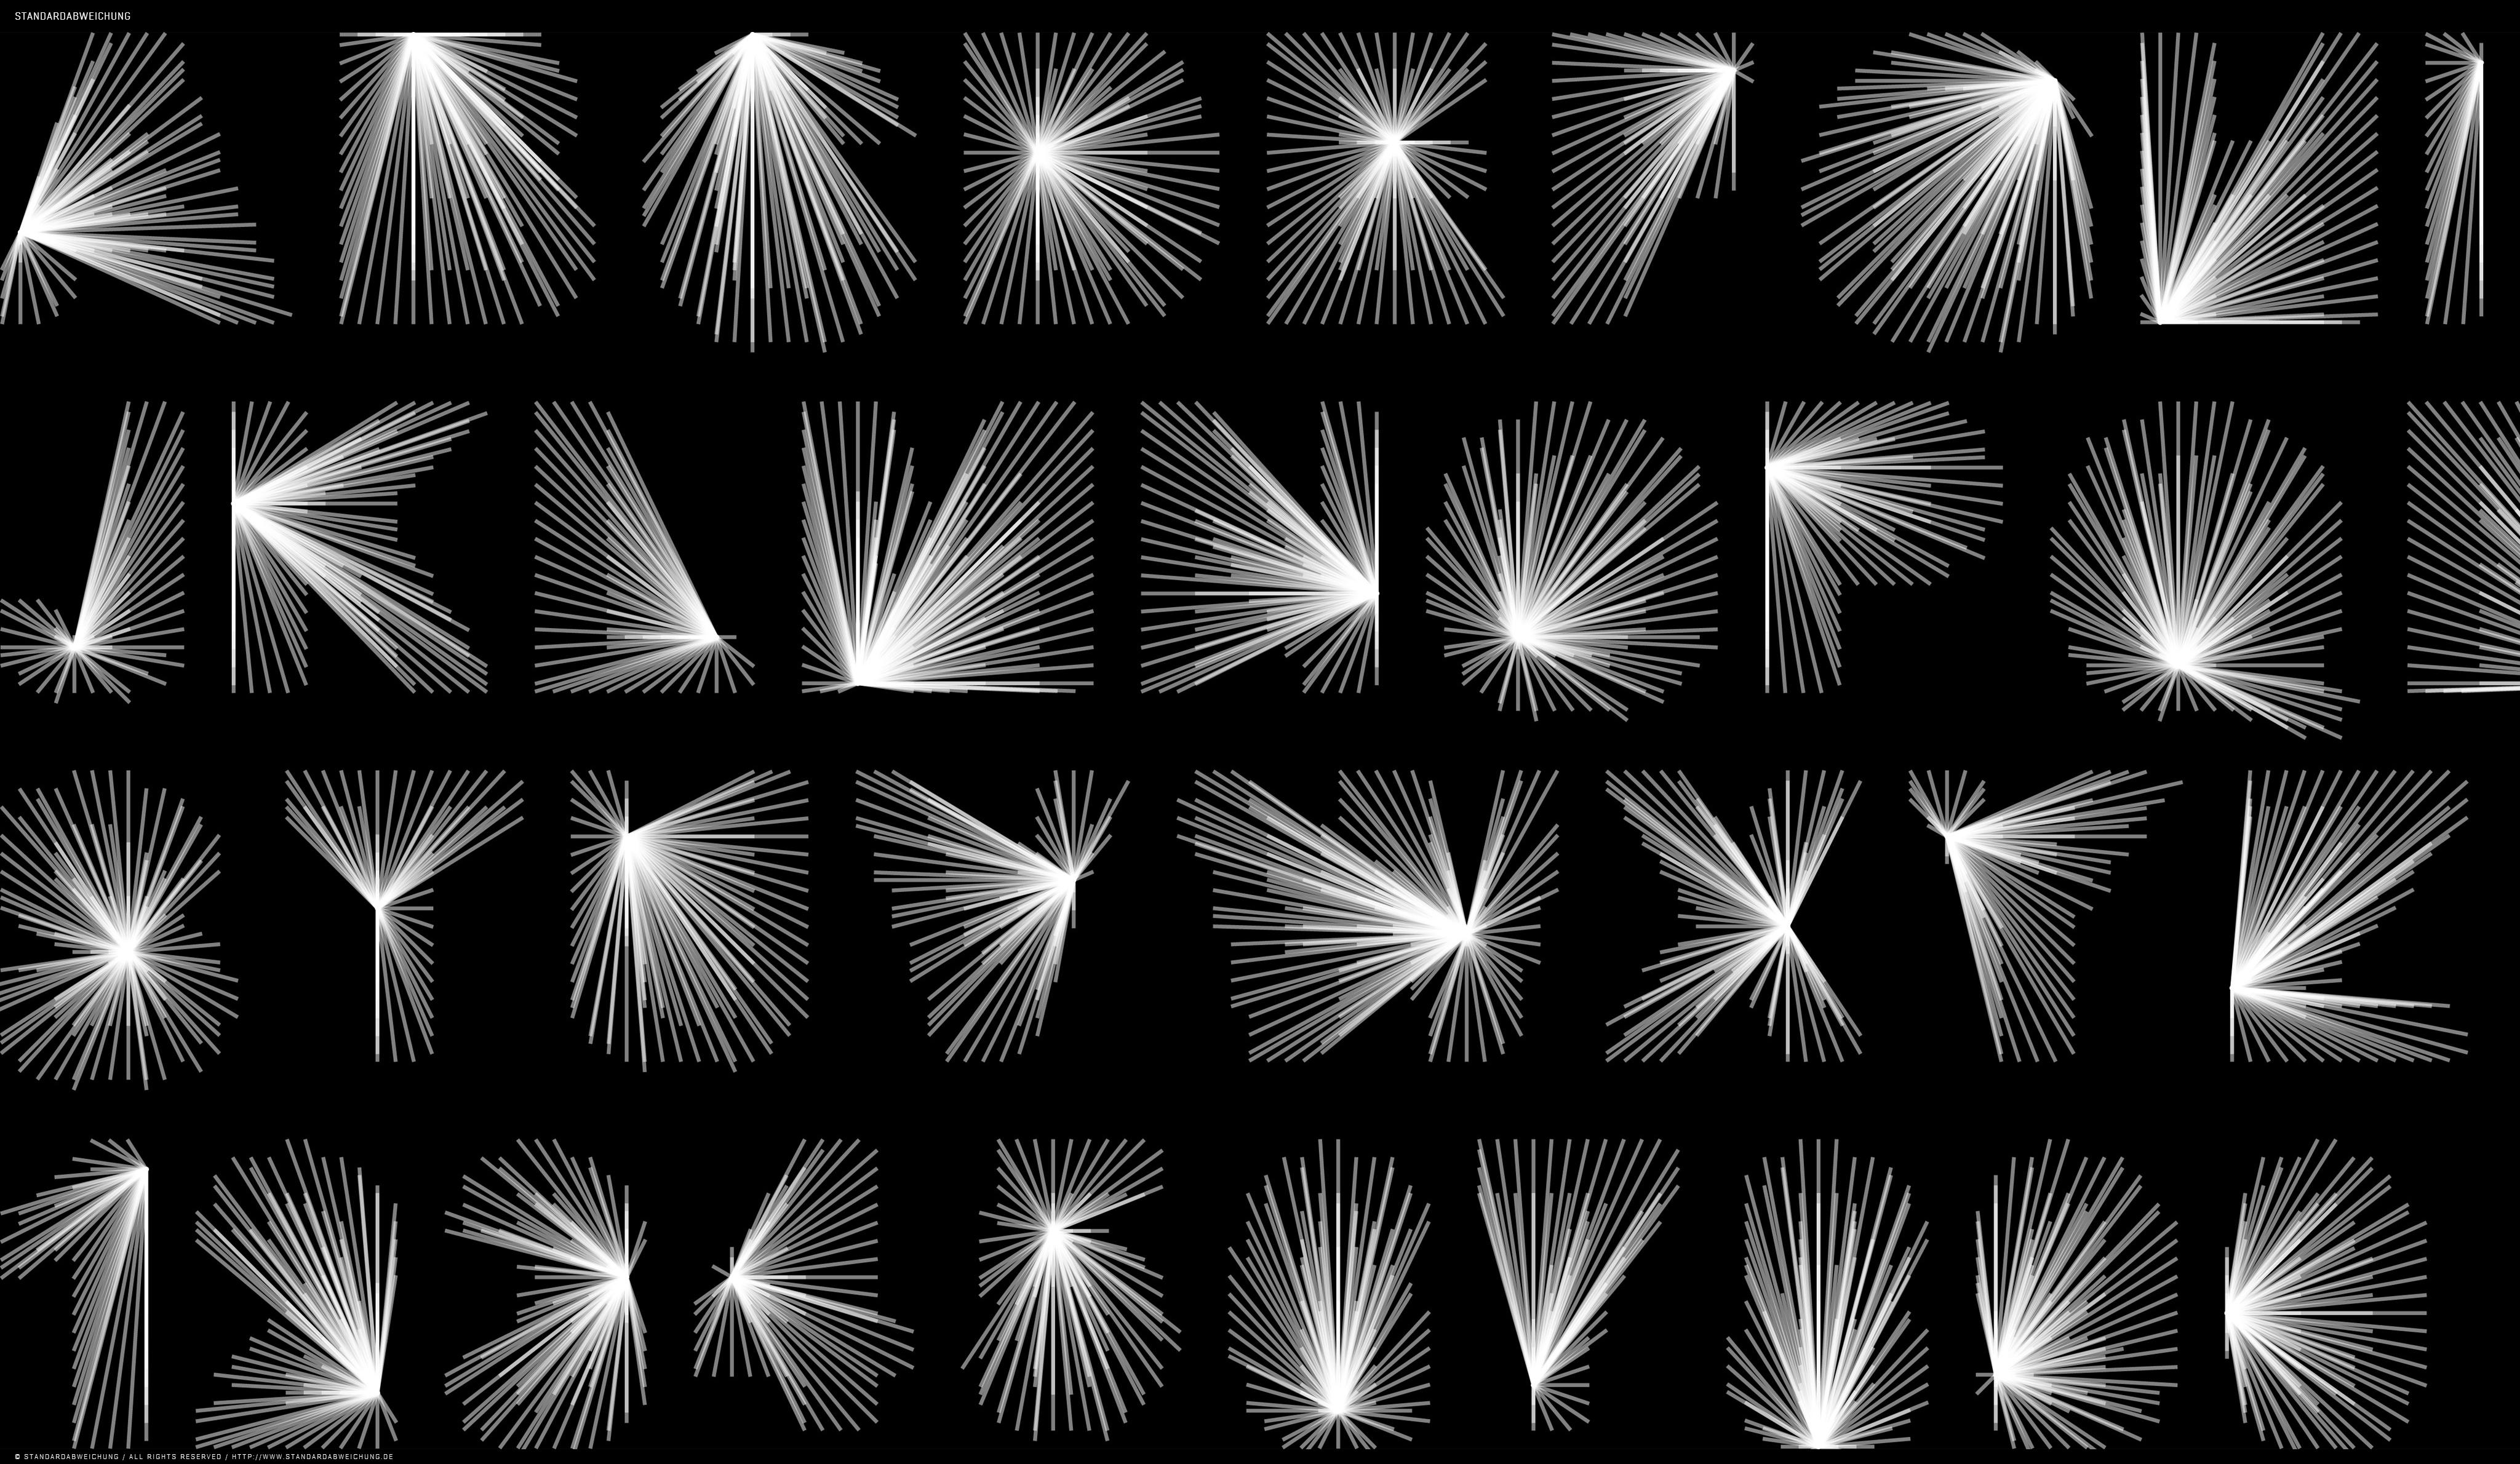 High Resolution Wallpaper | Generative 4096x2380 px